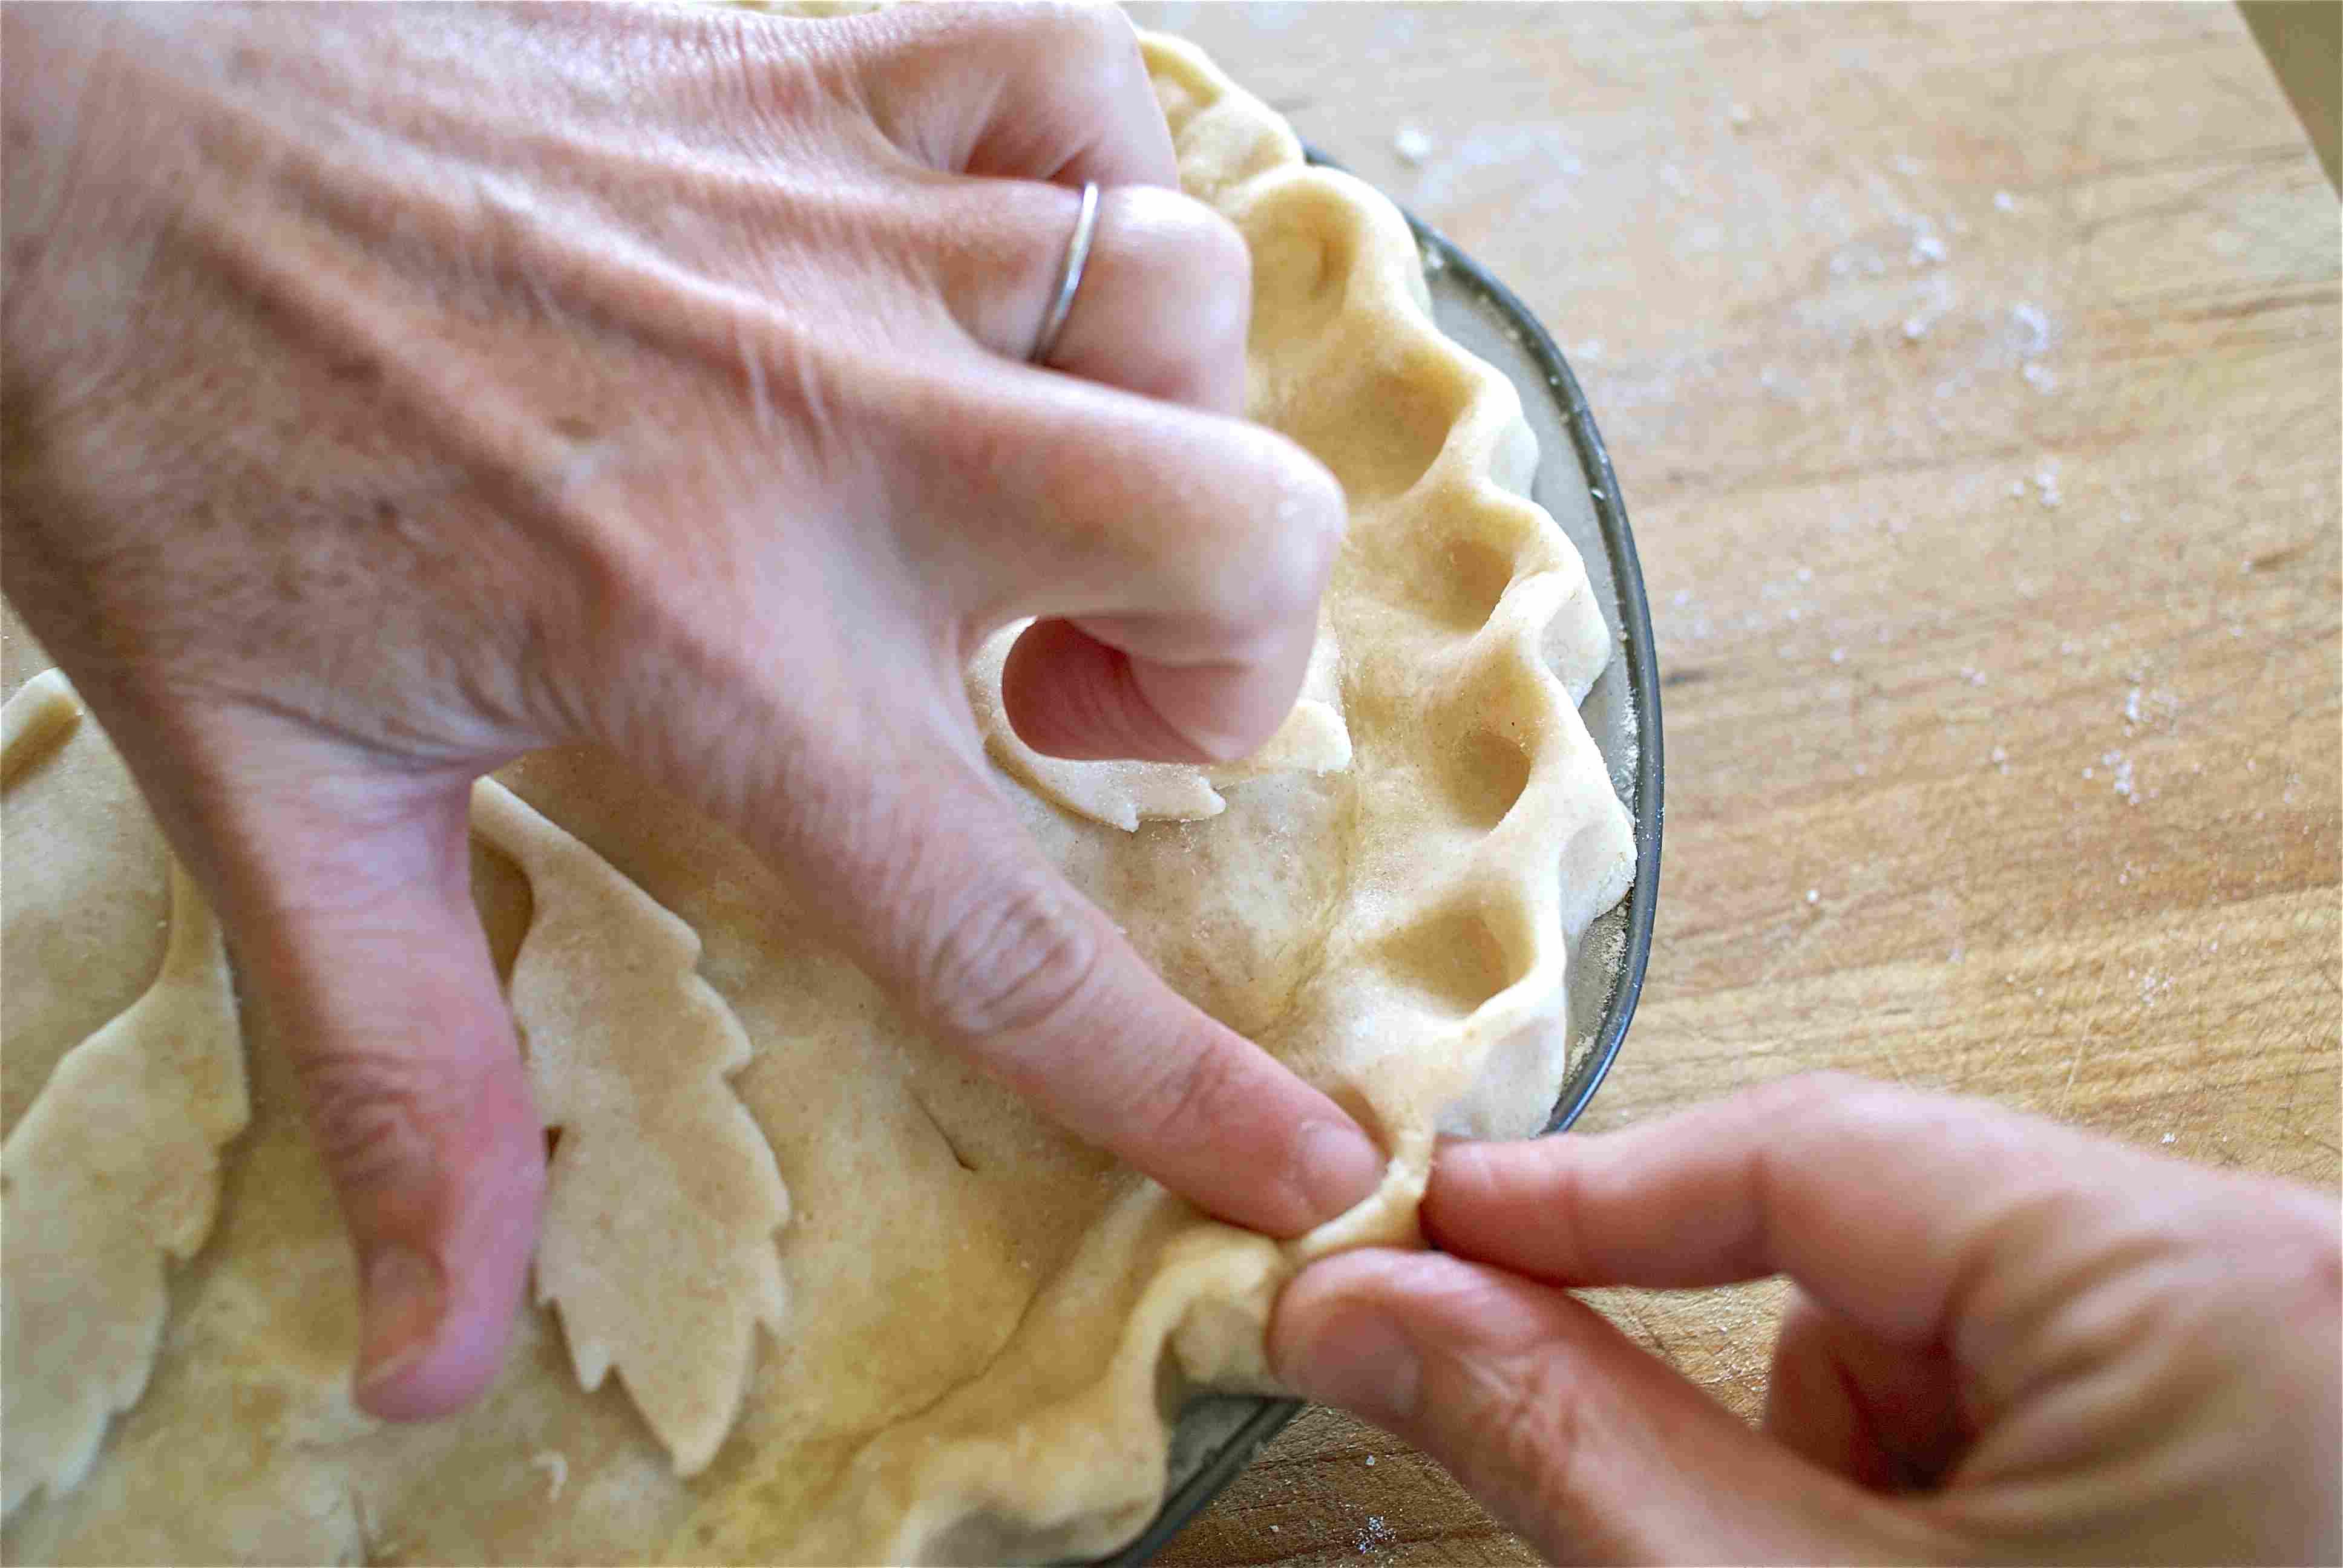 MinI-scallop pie crust crimp